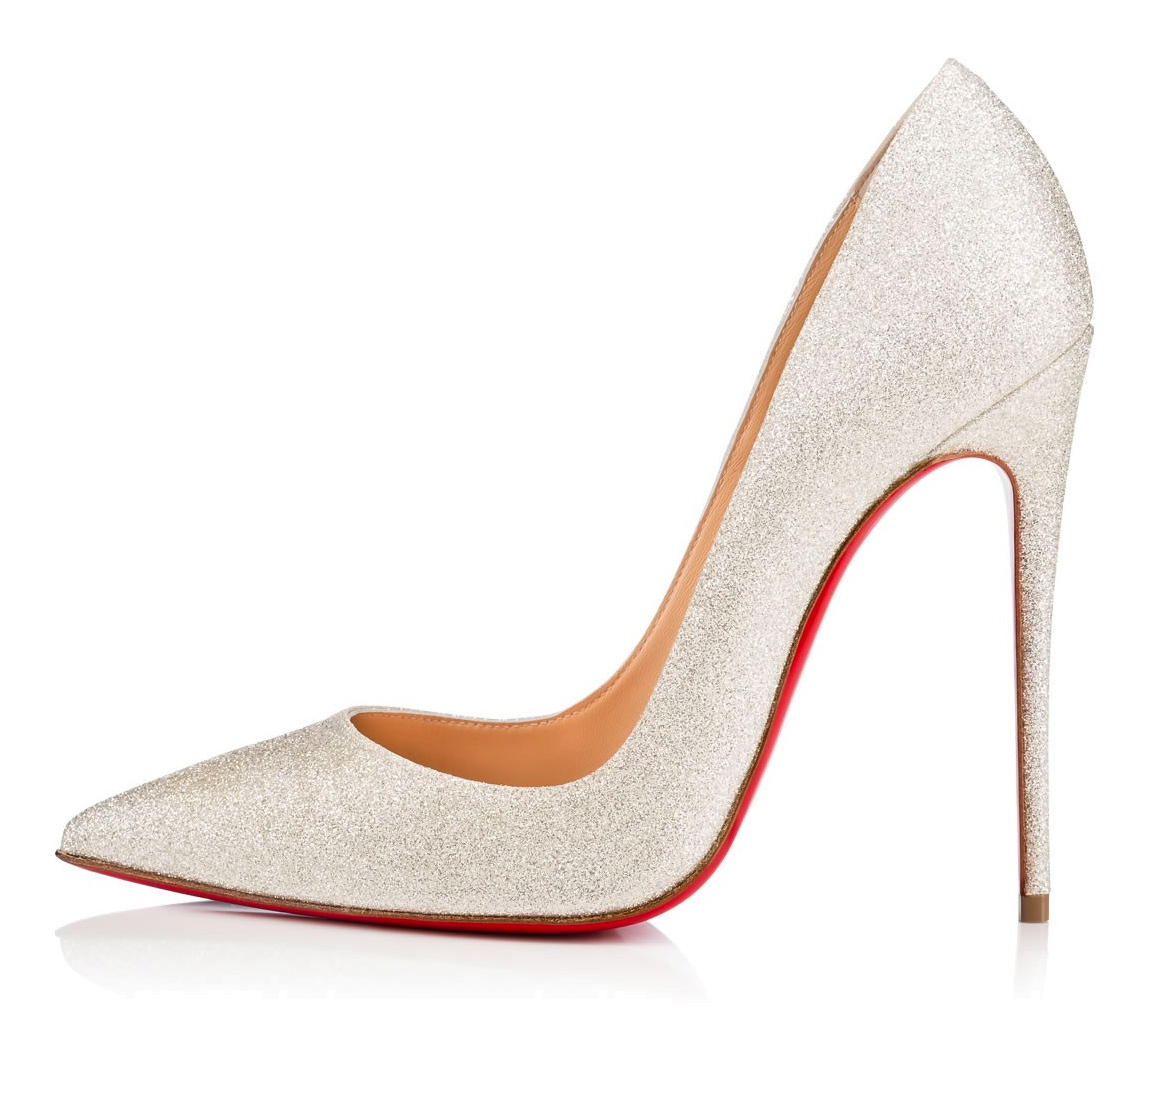 wholesale dealer aacb9 c6b7d Christian Louboutin So Kate 120 Glitter Shoes